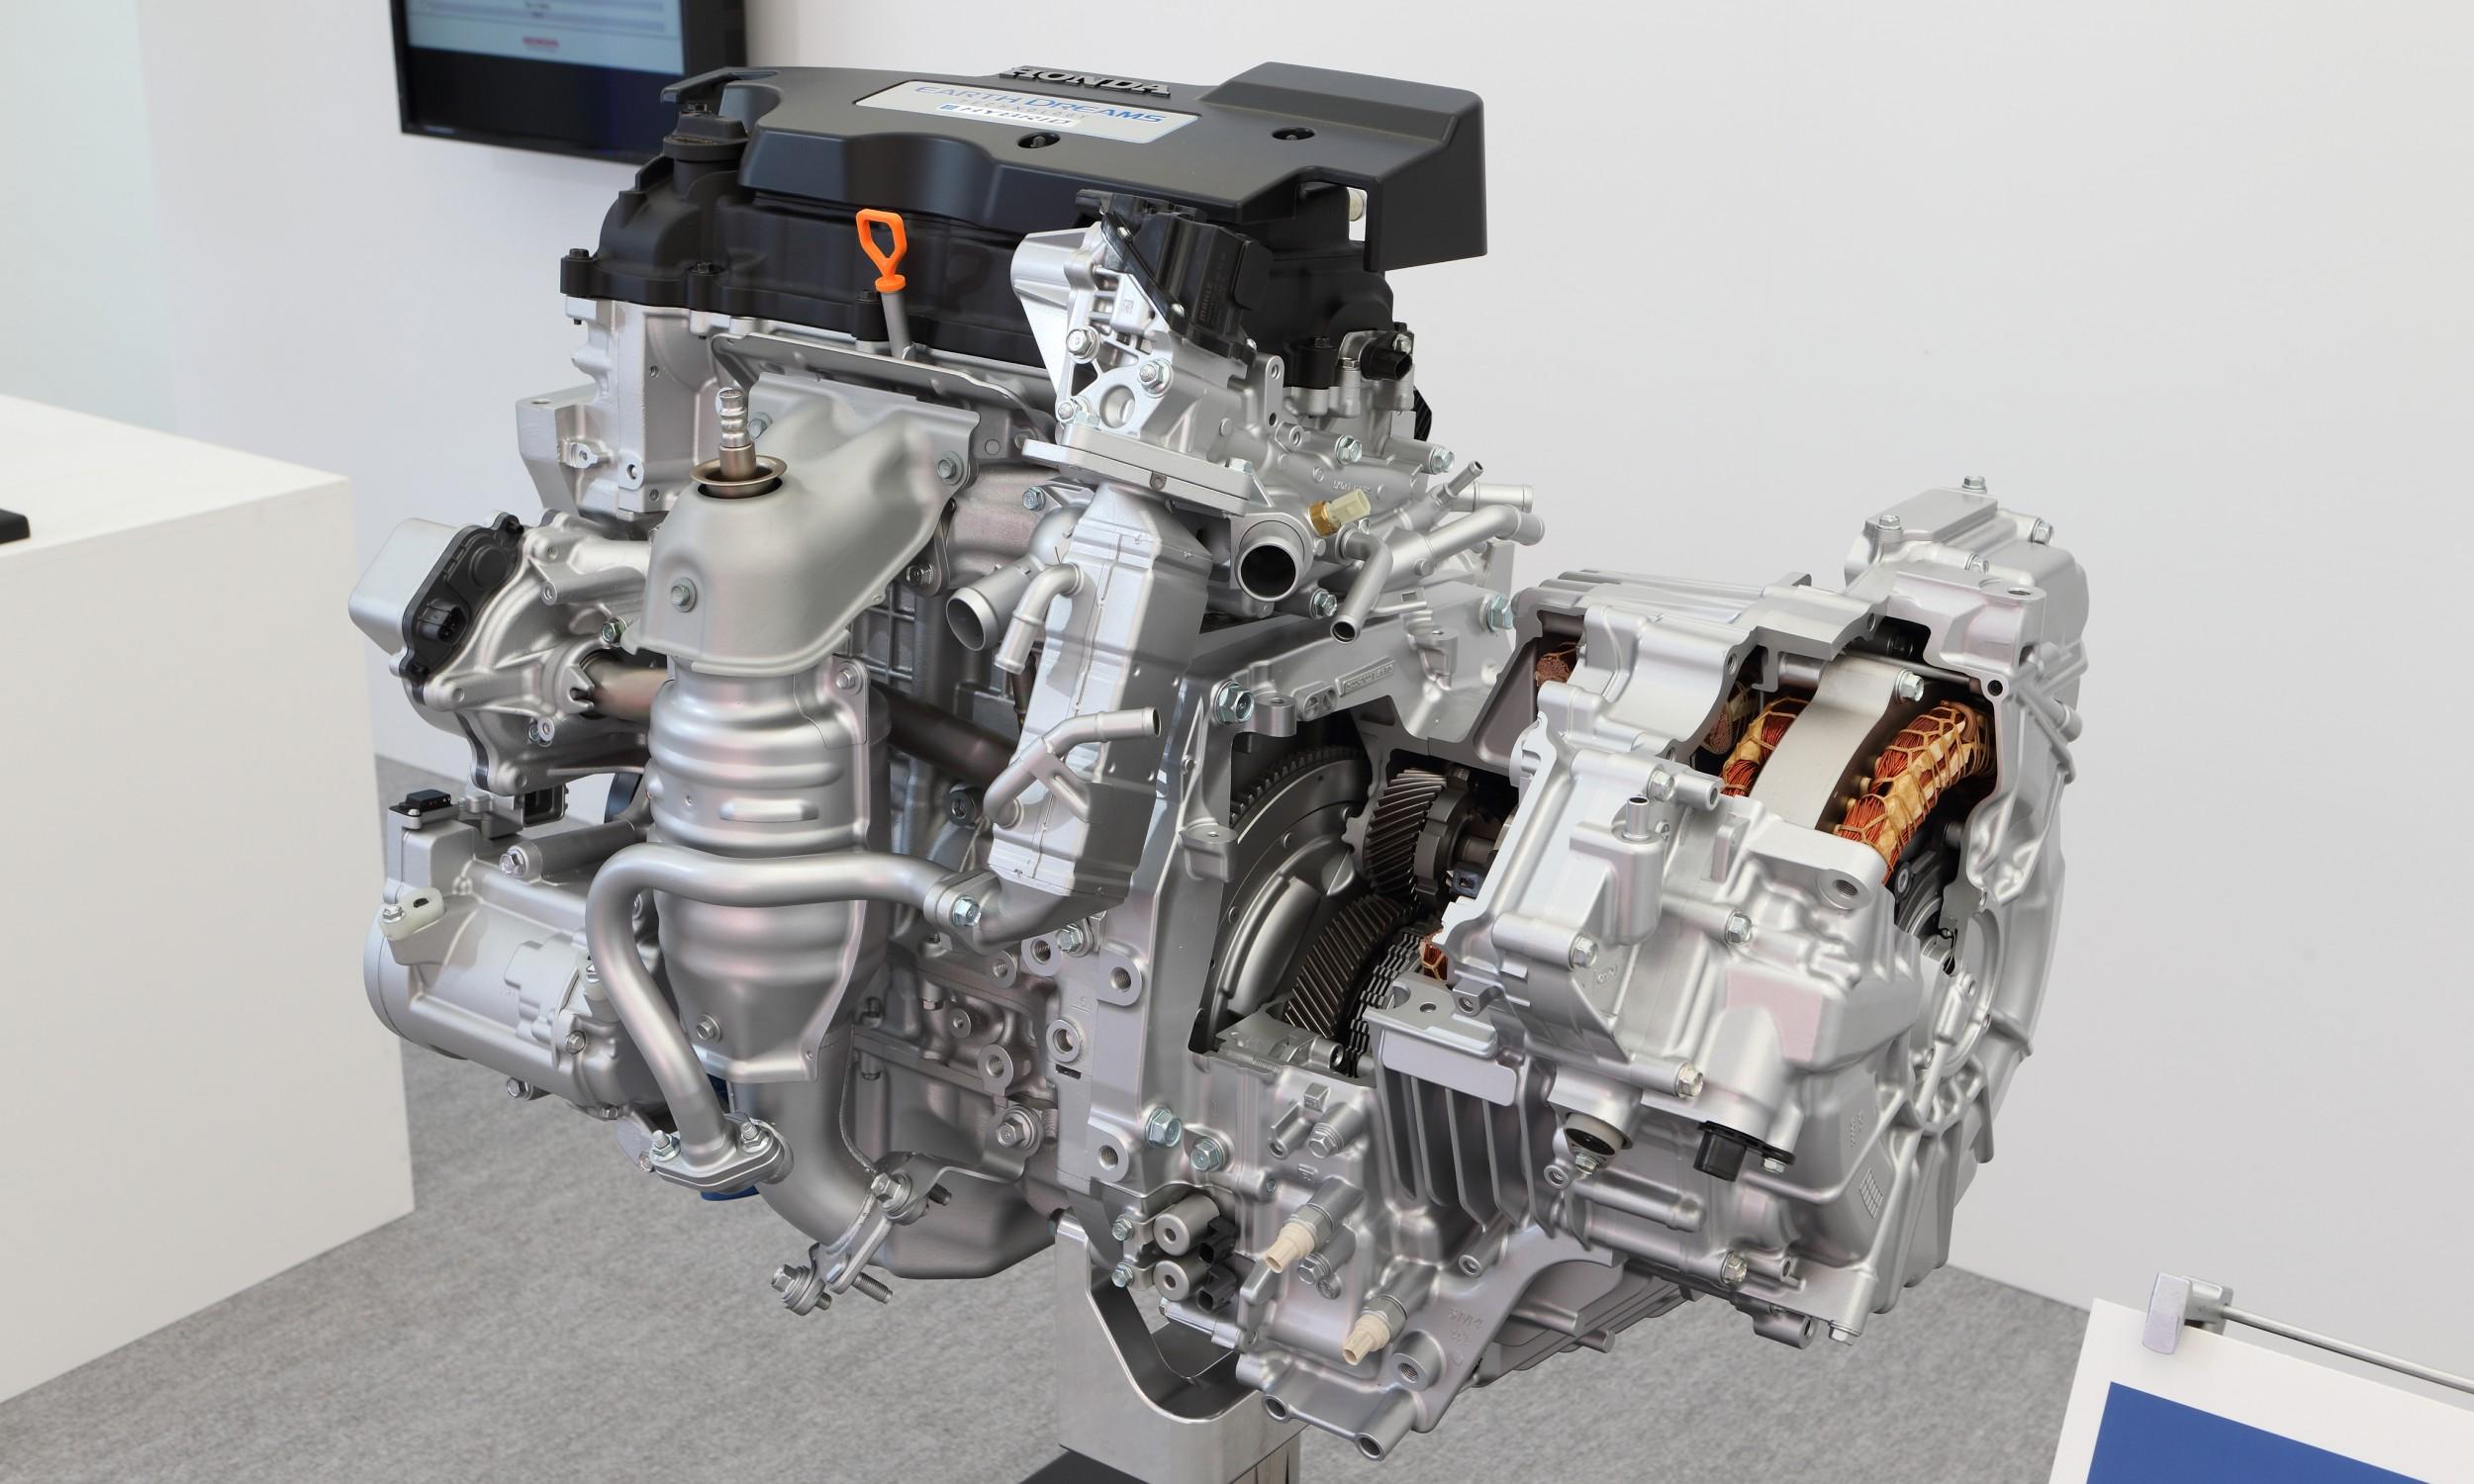 Honda cb400f 2074 furthermore  in addition 2018 Honda Cb300r 143kg Wet Usd Forks 31hp further 2017 Honda Cb1100rs likewise Sport Hybrid 15. on clutch for honda